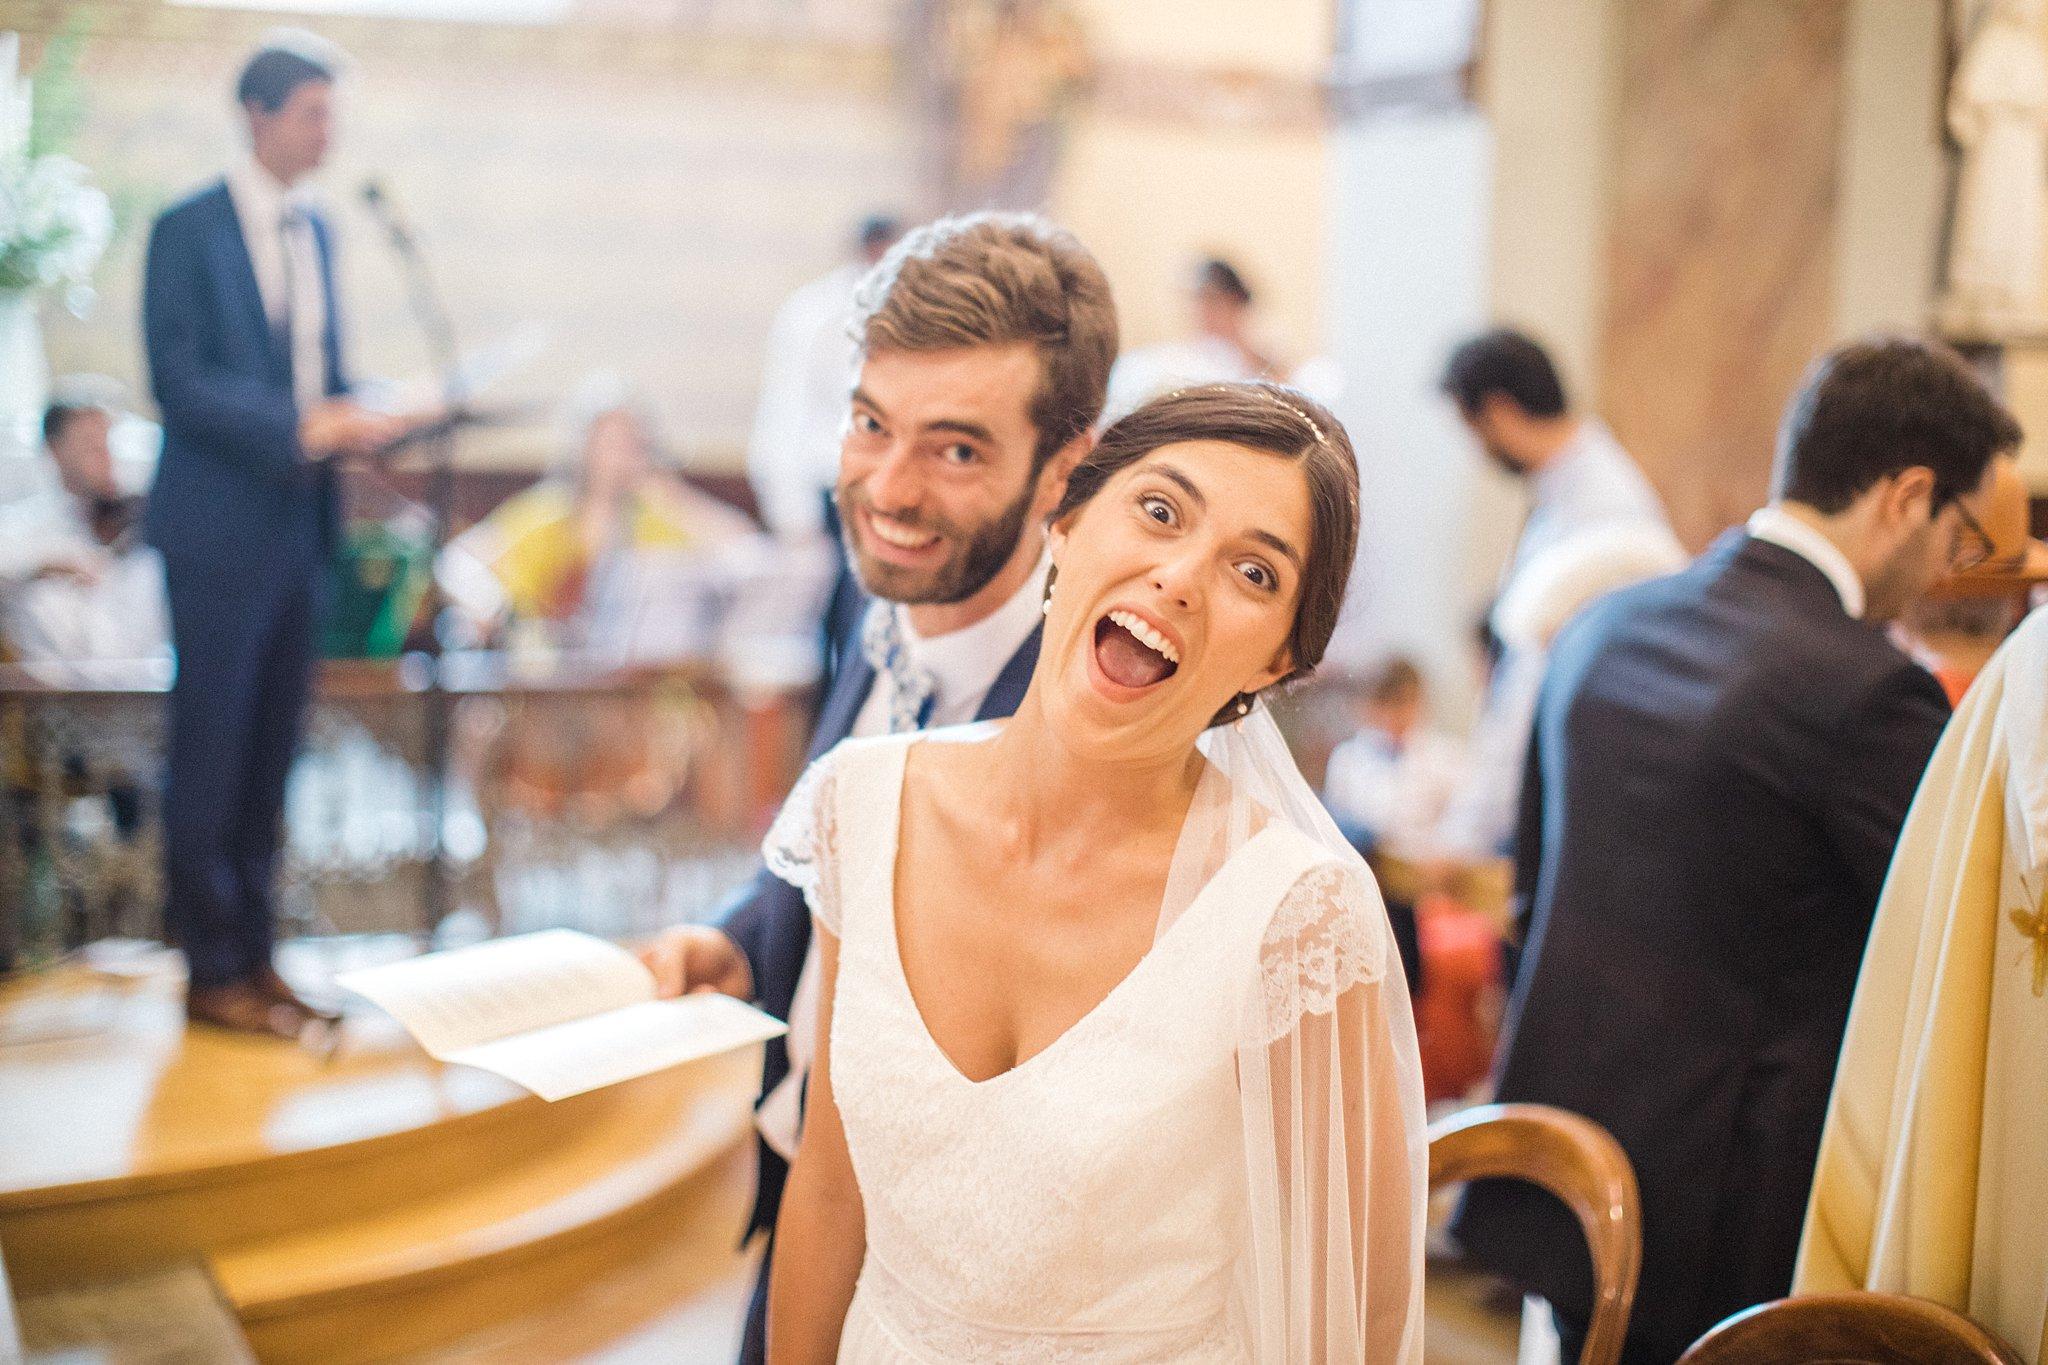 Mariage-a-la-maison-secall-hugo-hennequin-photographe-mariage-perpignan_0088.jpg